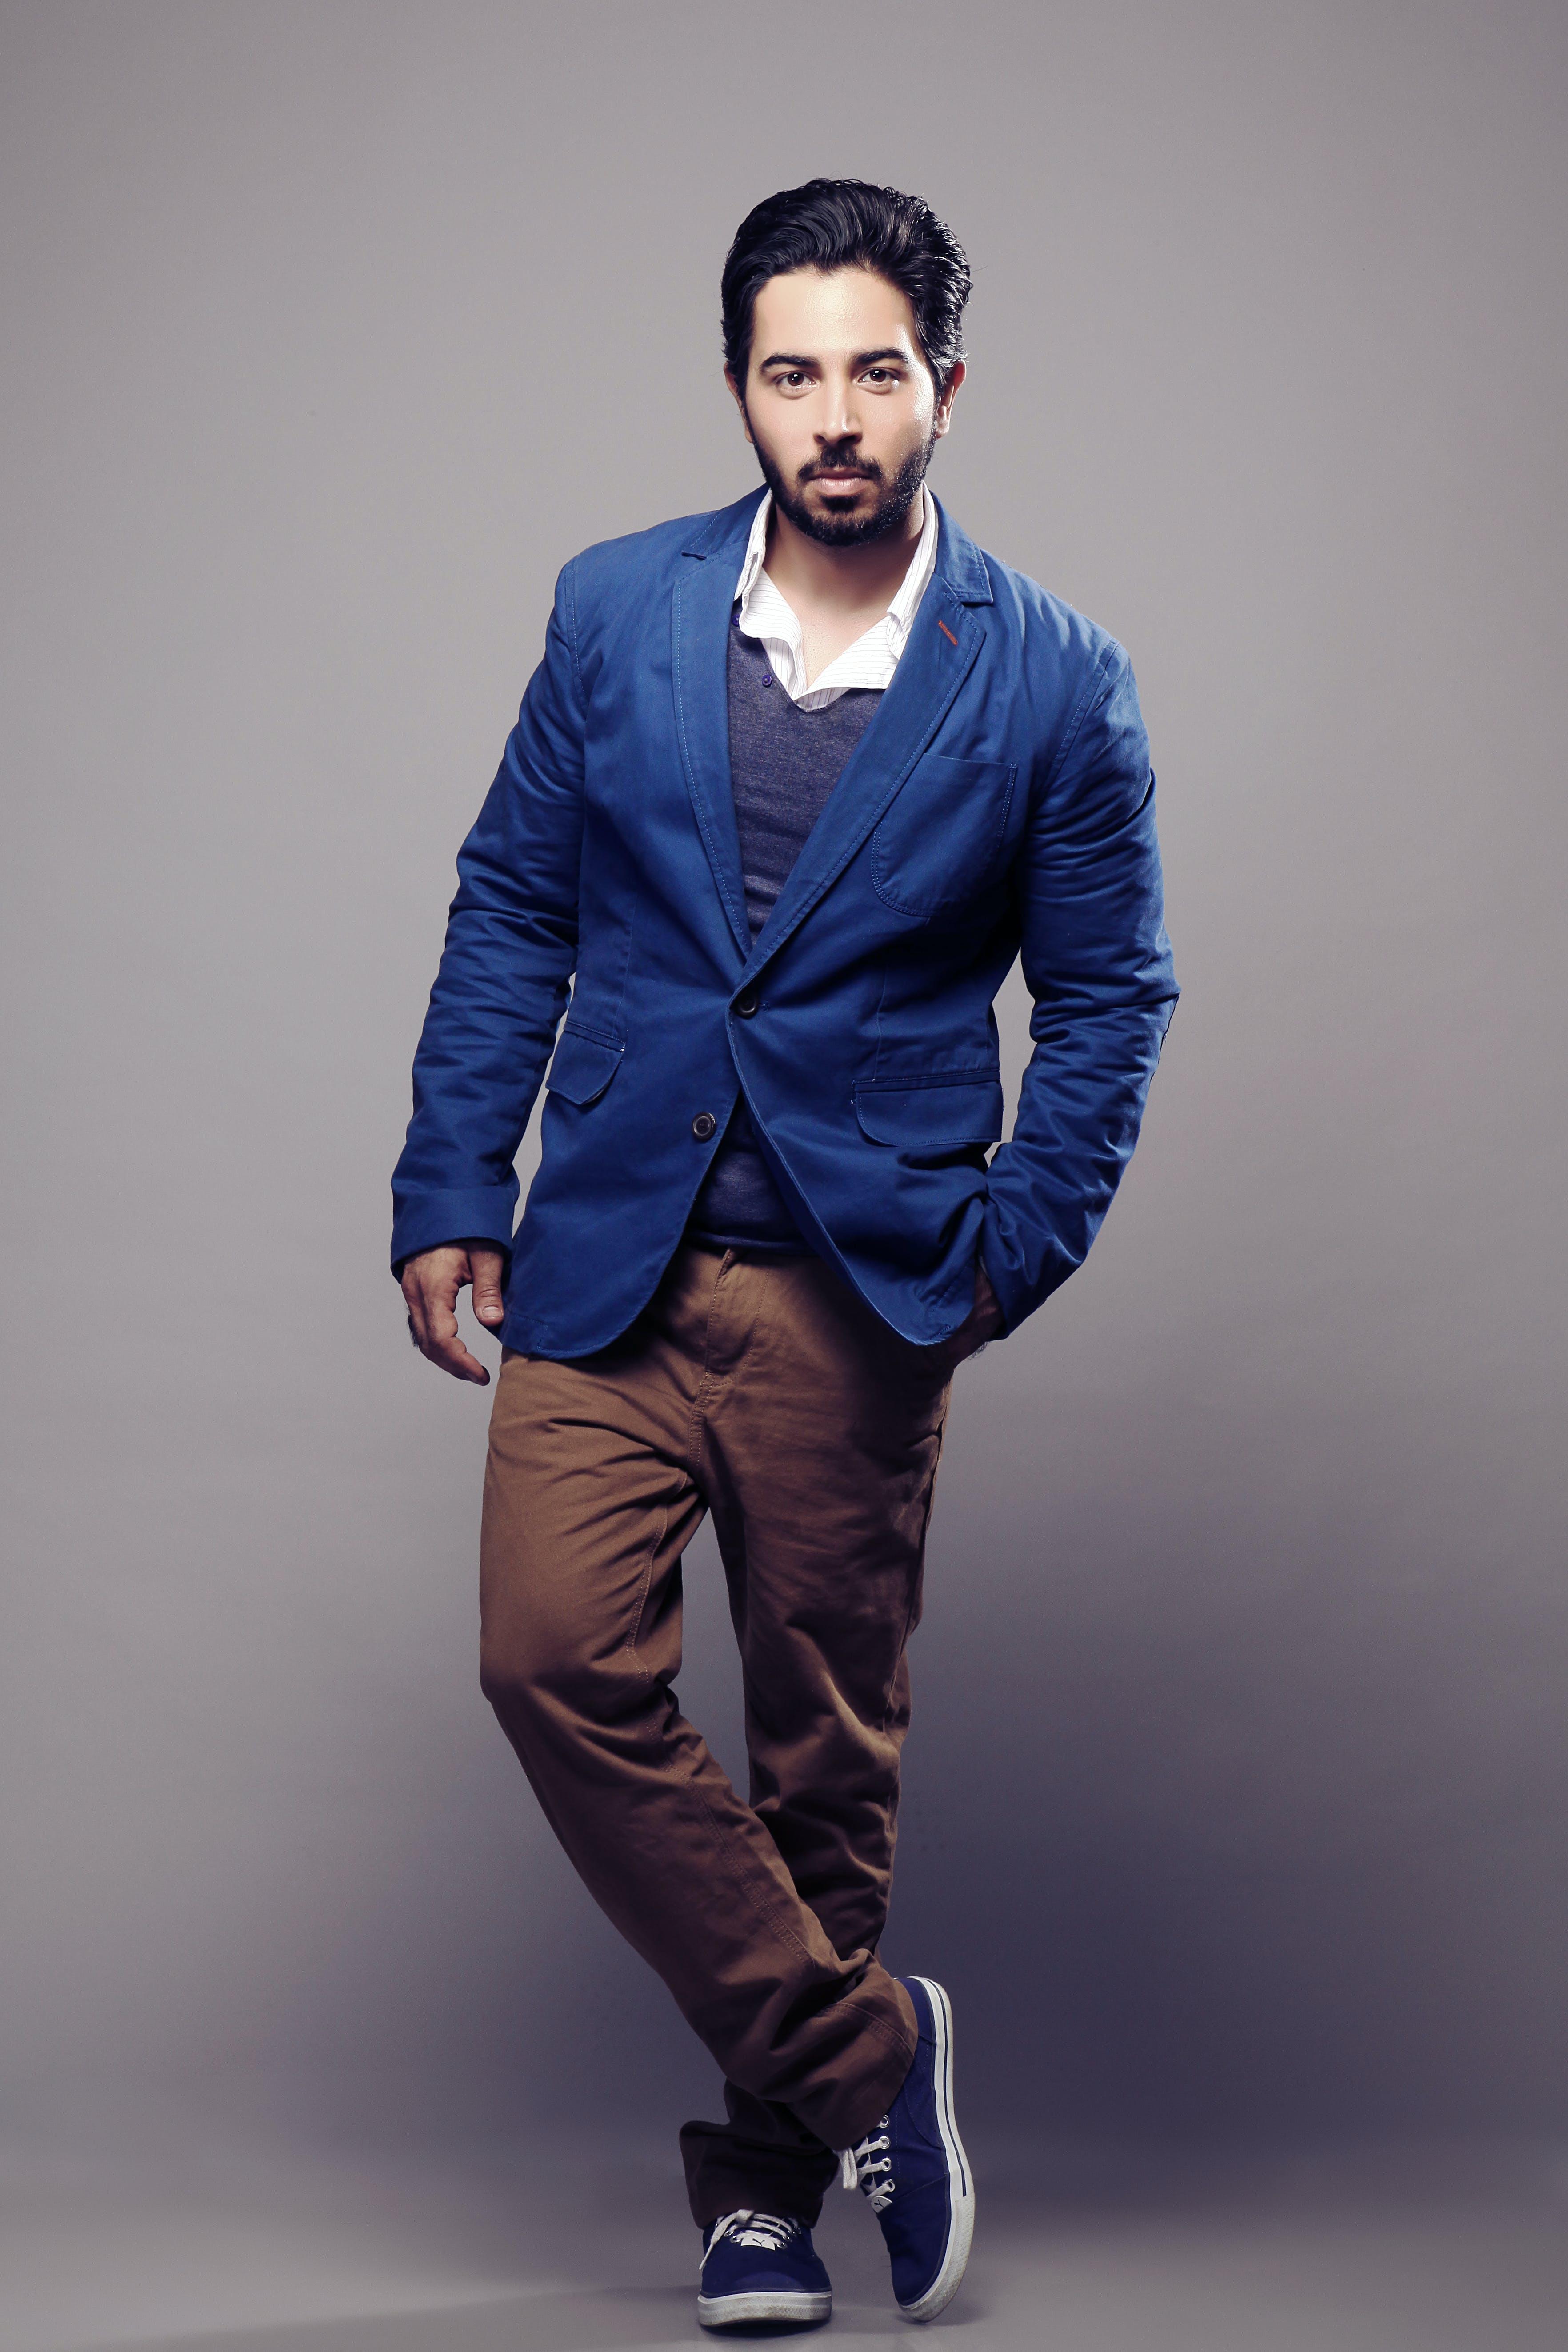 Free stock photo of businessman in beard posing